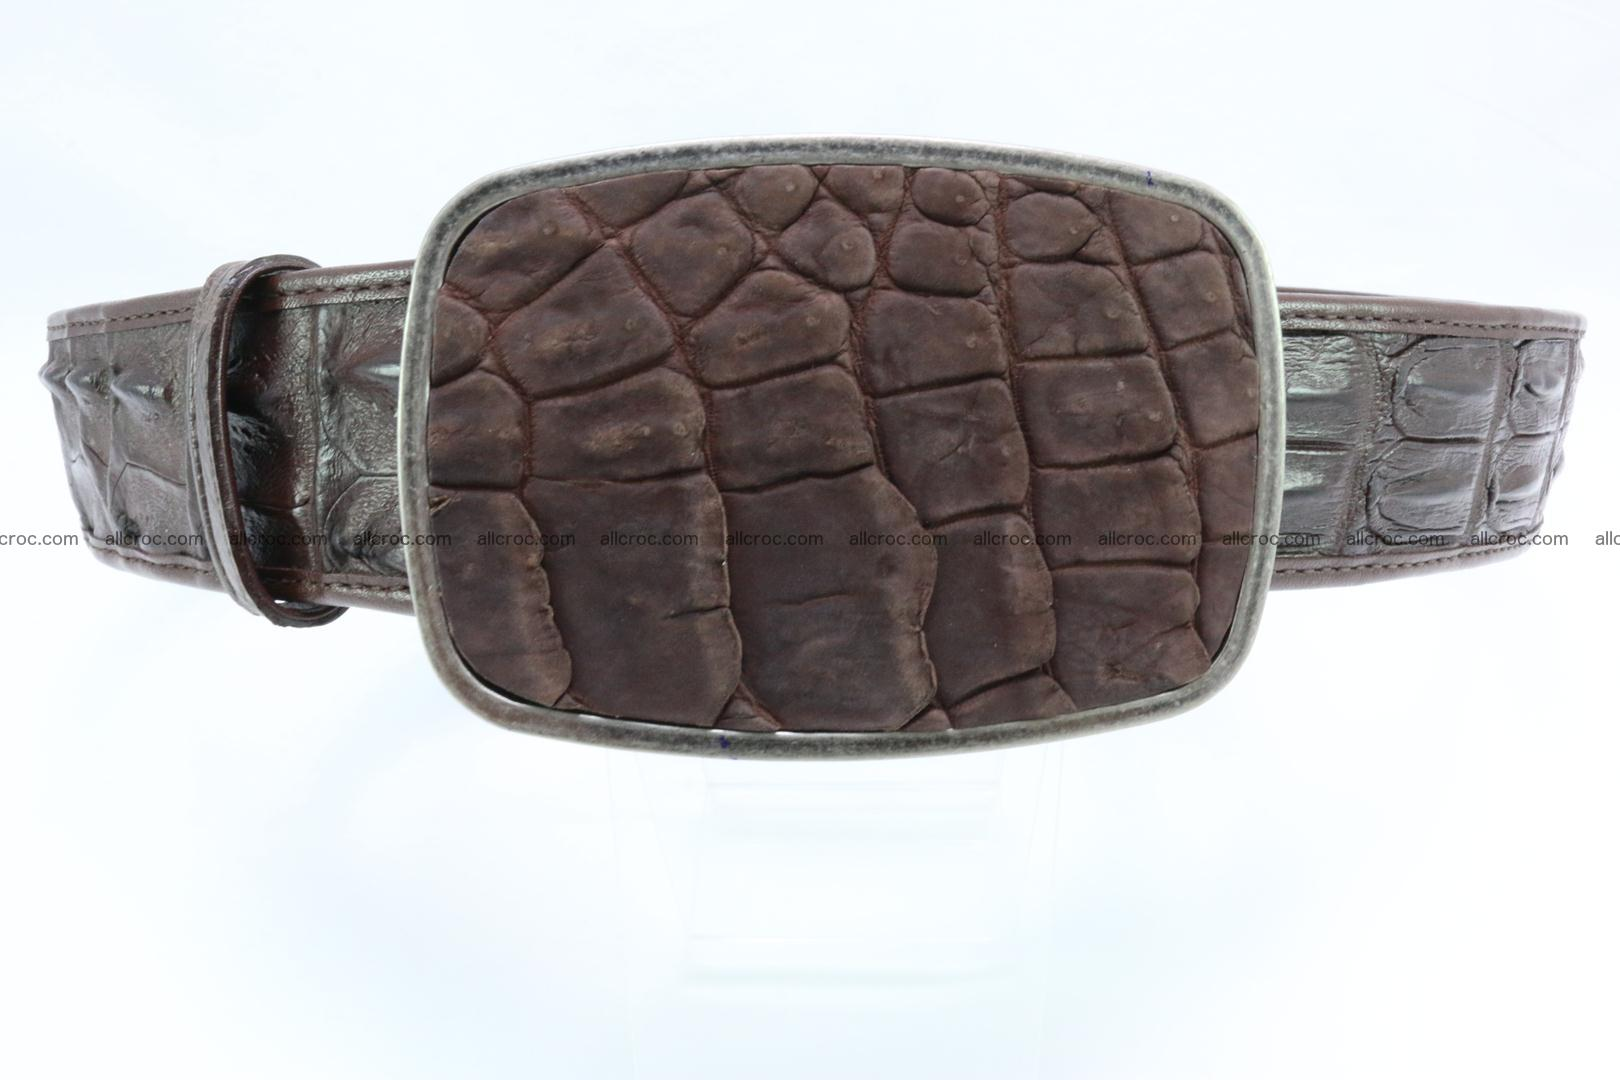 Genuine crocodile leather hornback belt 086 Foto 0